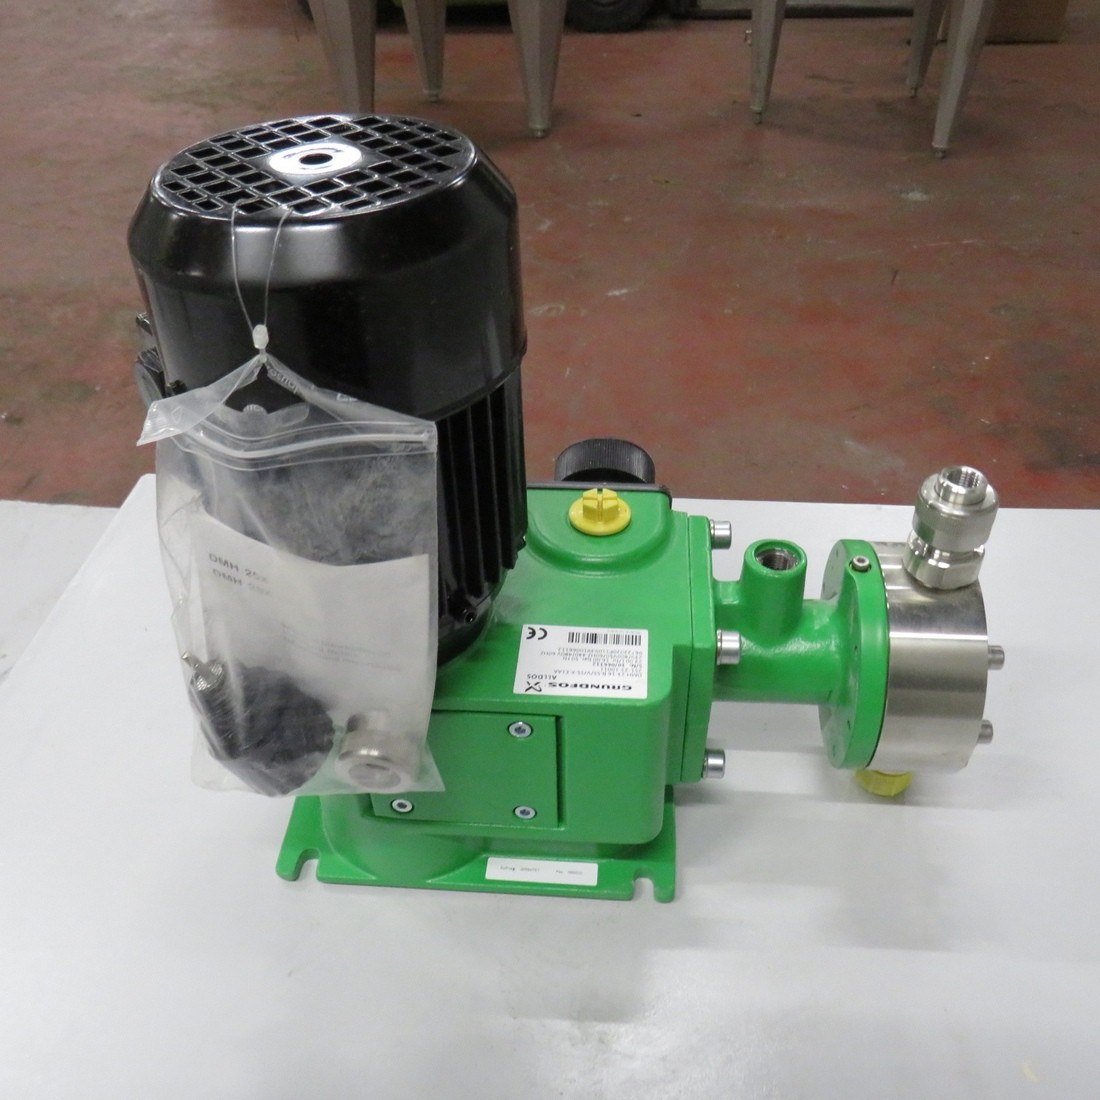 R10N759 Stainless steel GRUNDFOS dosing pump DMH 23-16 type